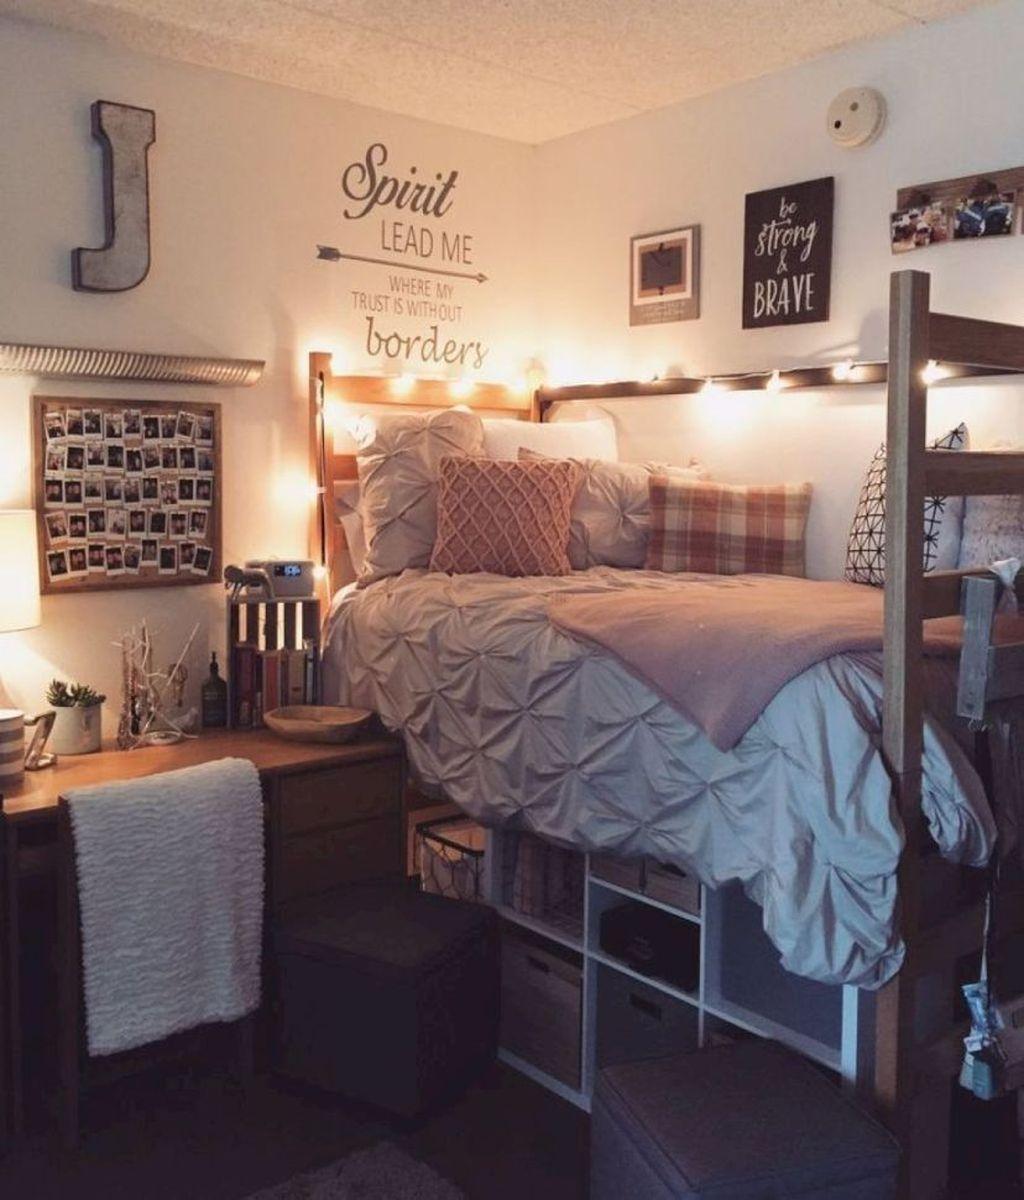 34 vintage dorm room organization ideas for saving space | home